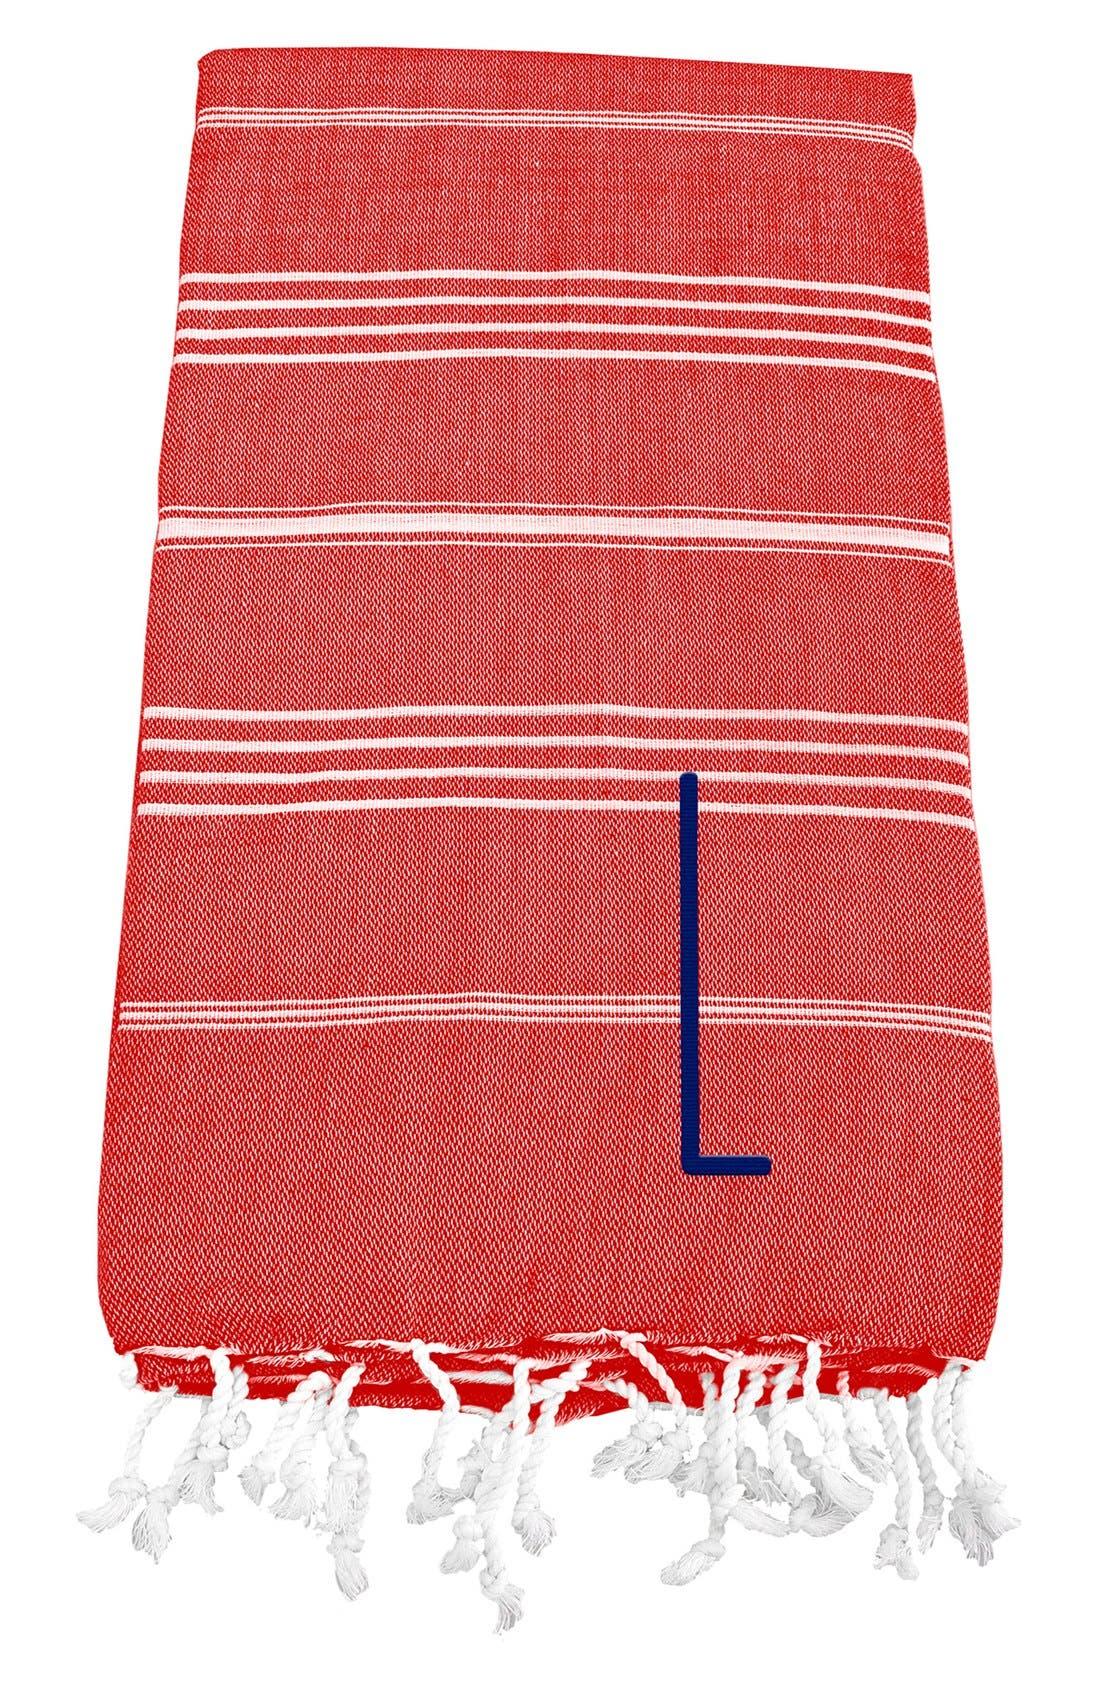 Monogram Turkish Cotton Towel,                             Main thumbnail 1, color,                             Red - L